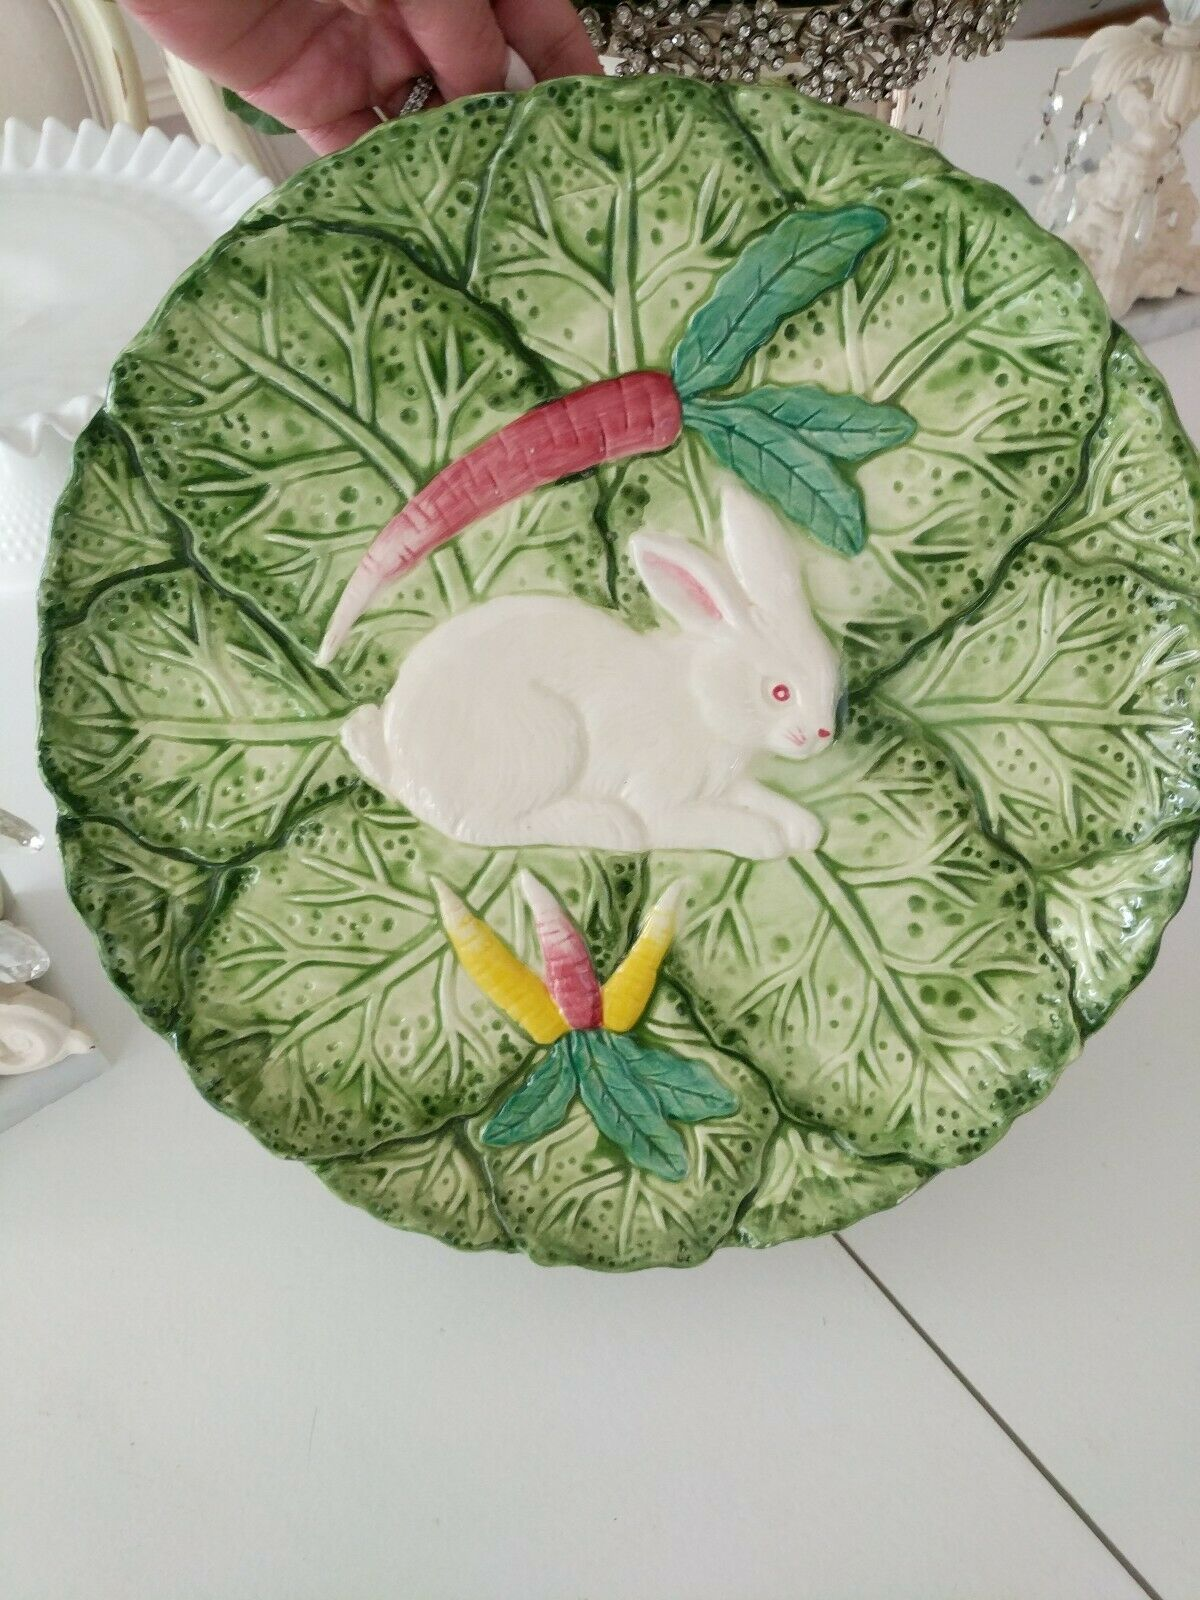 Bunny Lane Pedestal Serving Platter Cake Plate 12.5  Easter Strata Group